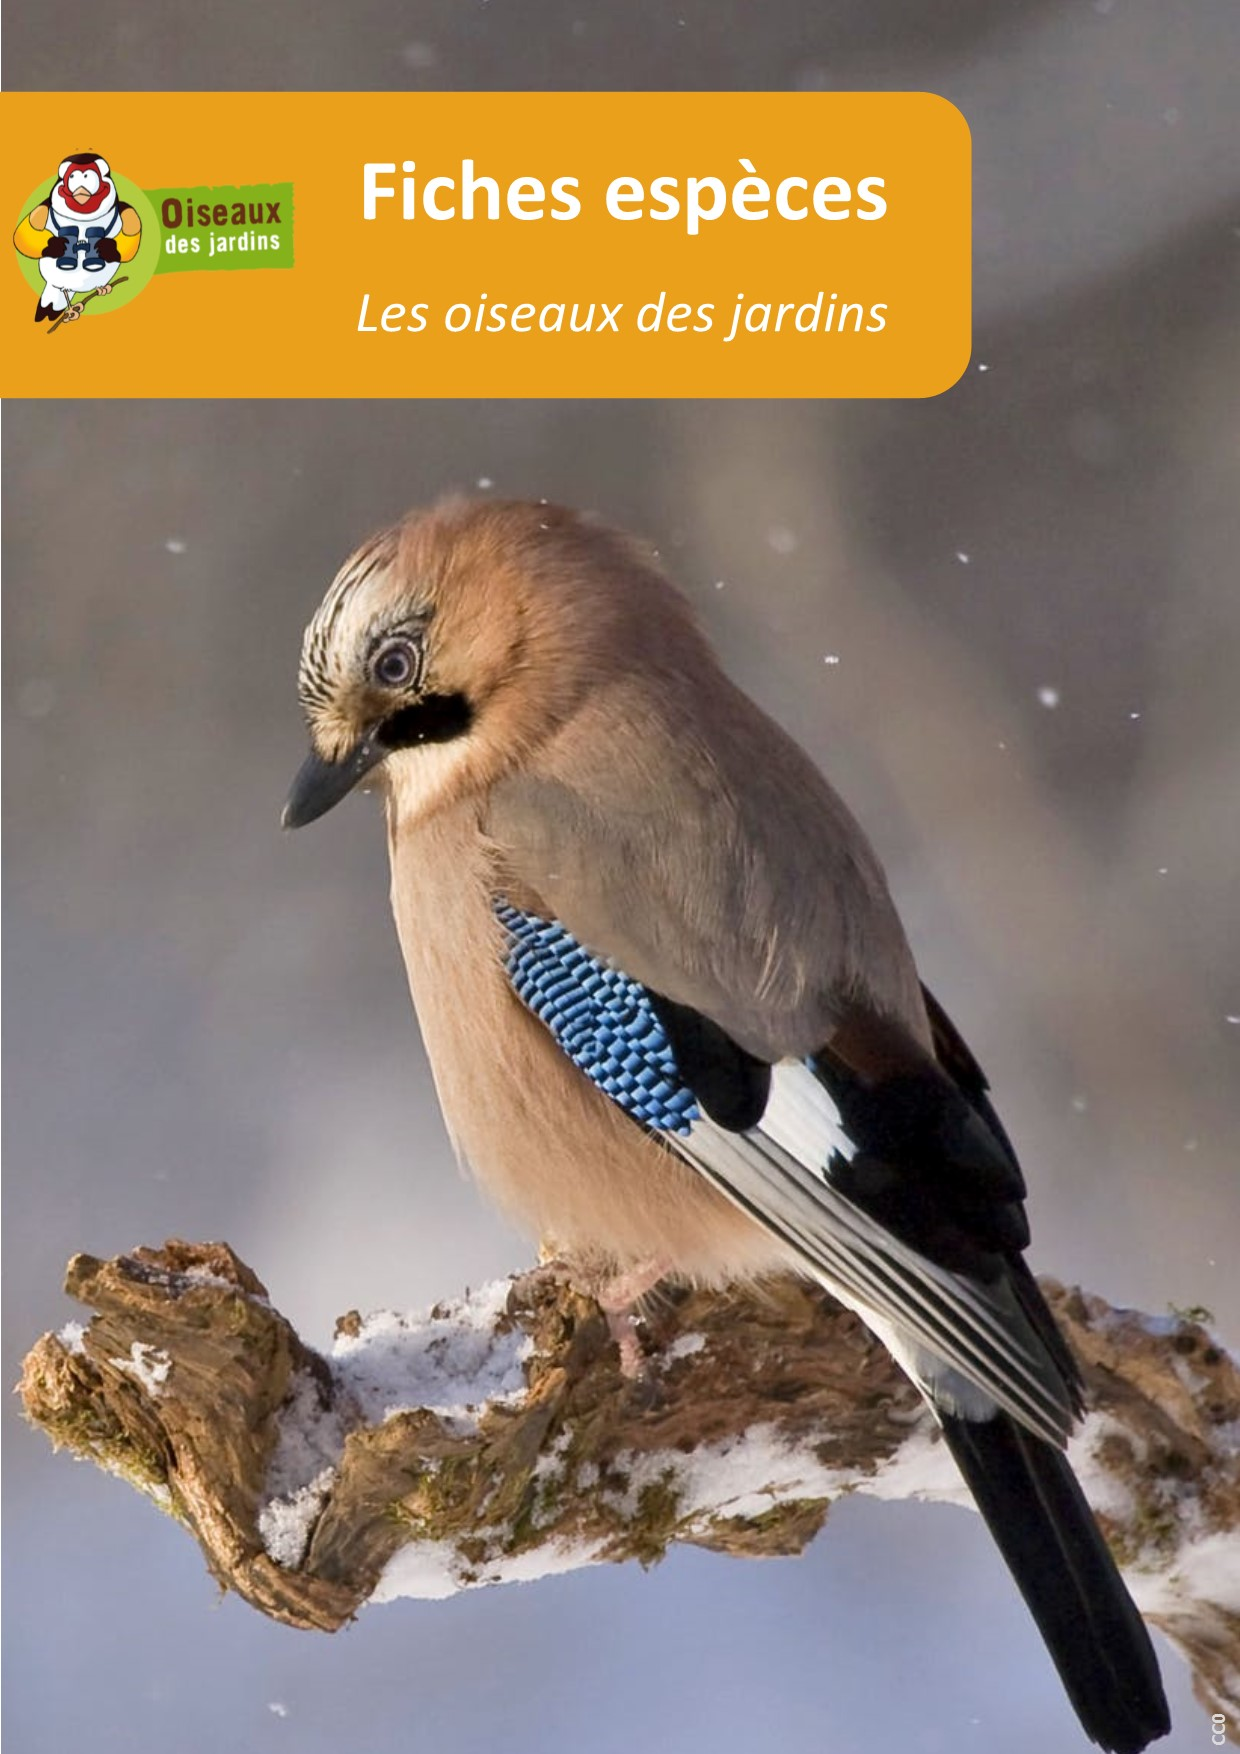 https://cdnfiles1.biolovision.net/www.oiseauxdesjardins.fr/userfiles/Fichesespces/Composition2.jpg